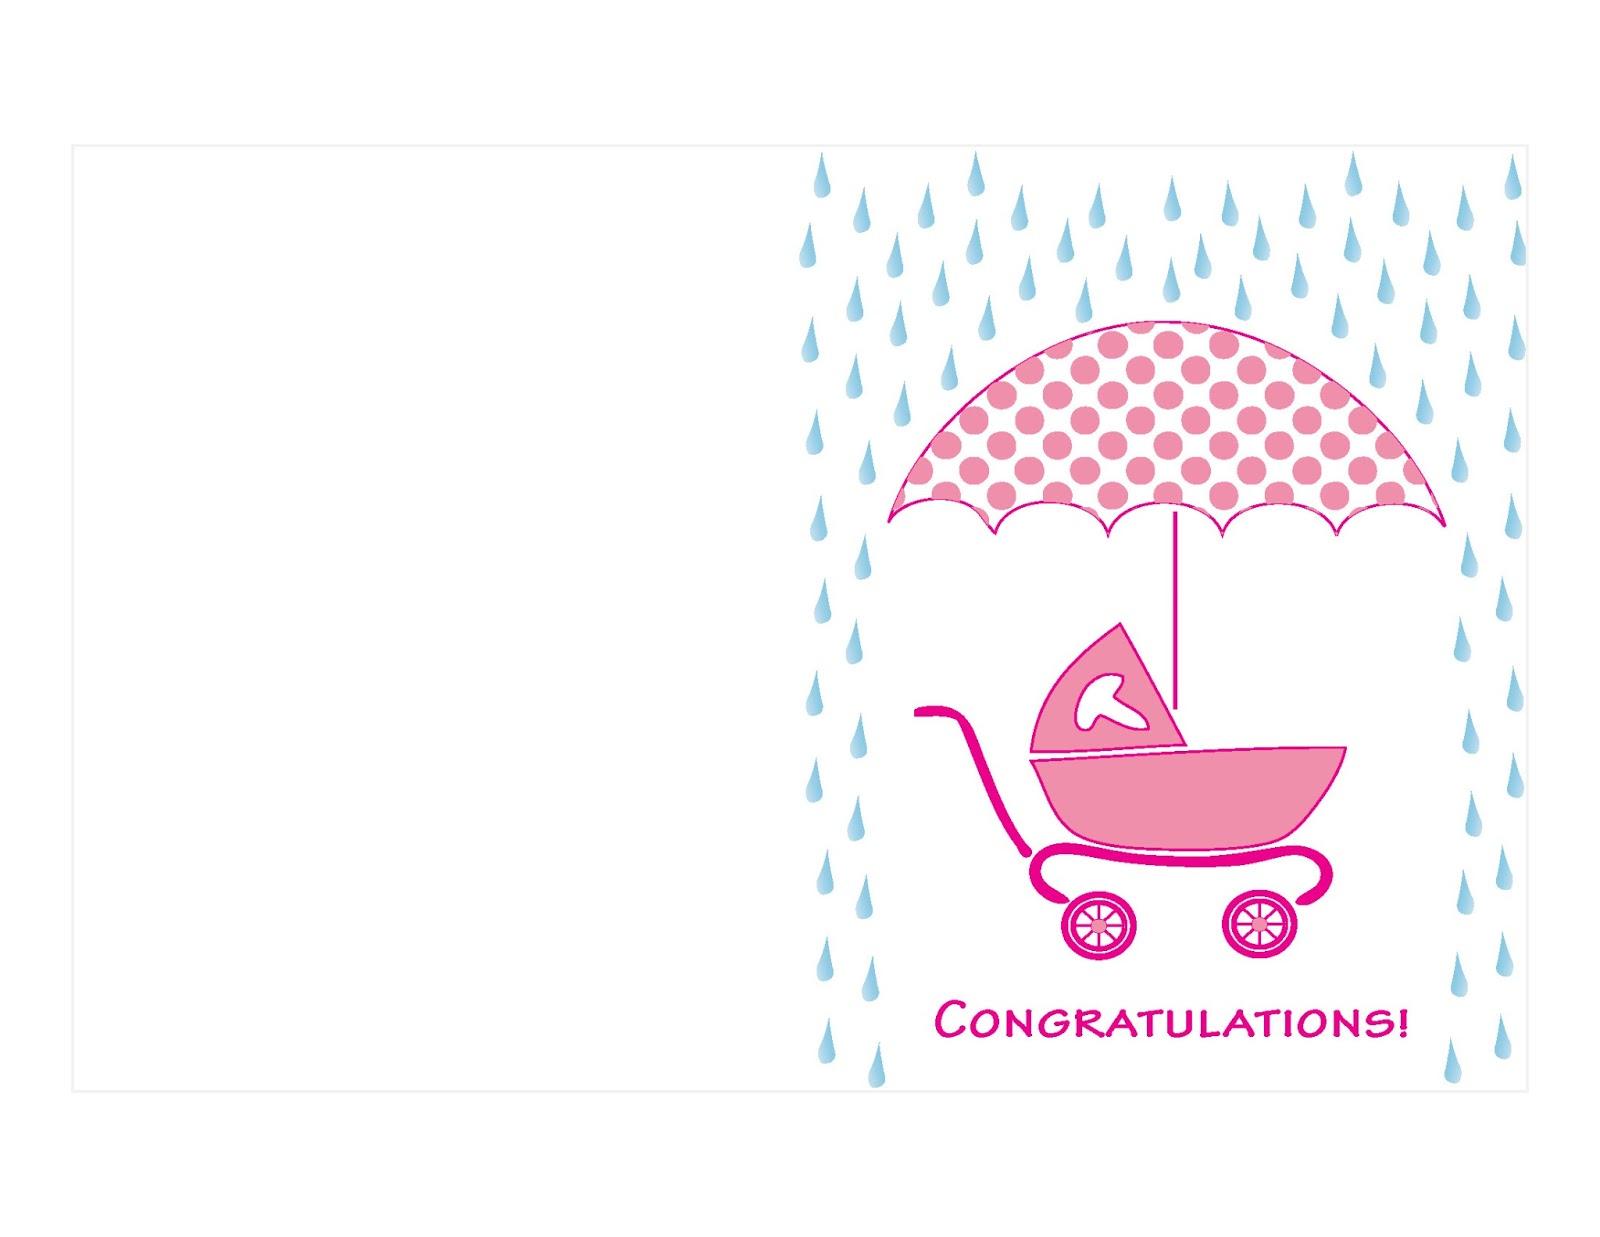 Photo : Free-Printable-Baby-Shower-Bingo-Cards-Reva Free Baby Shower - Baby Shower Cards Online Free Printable